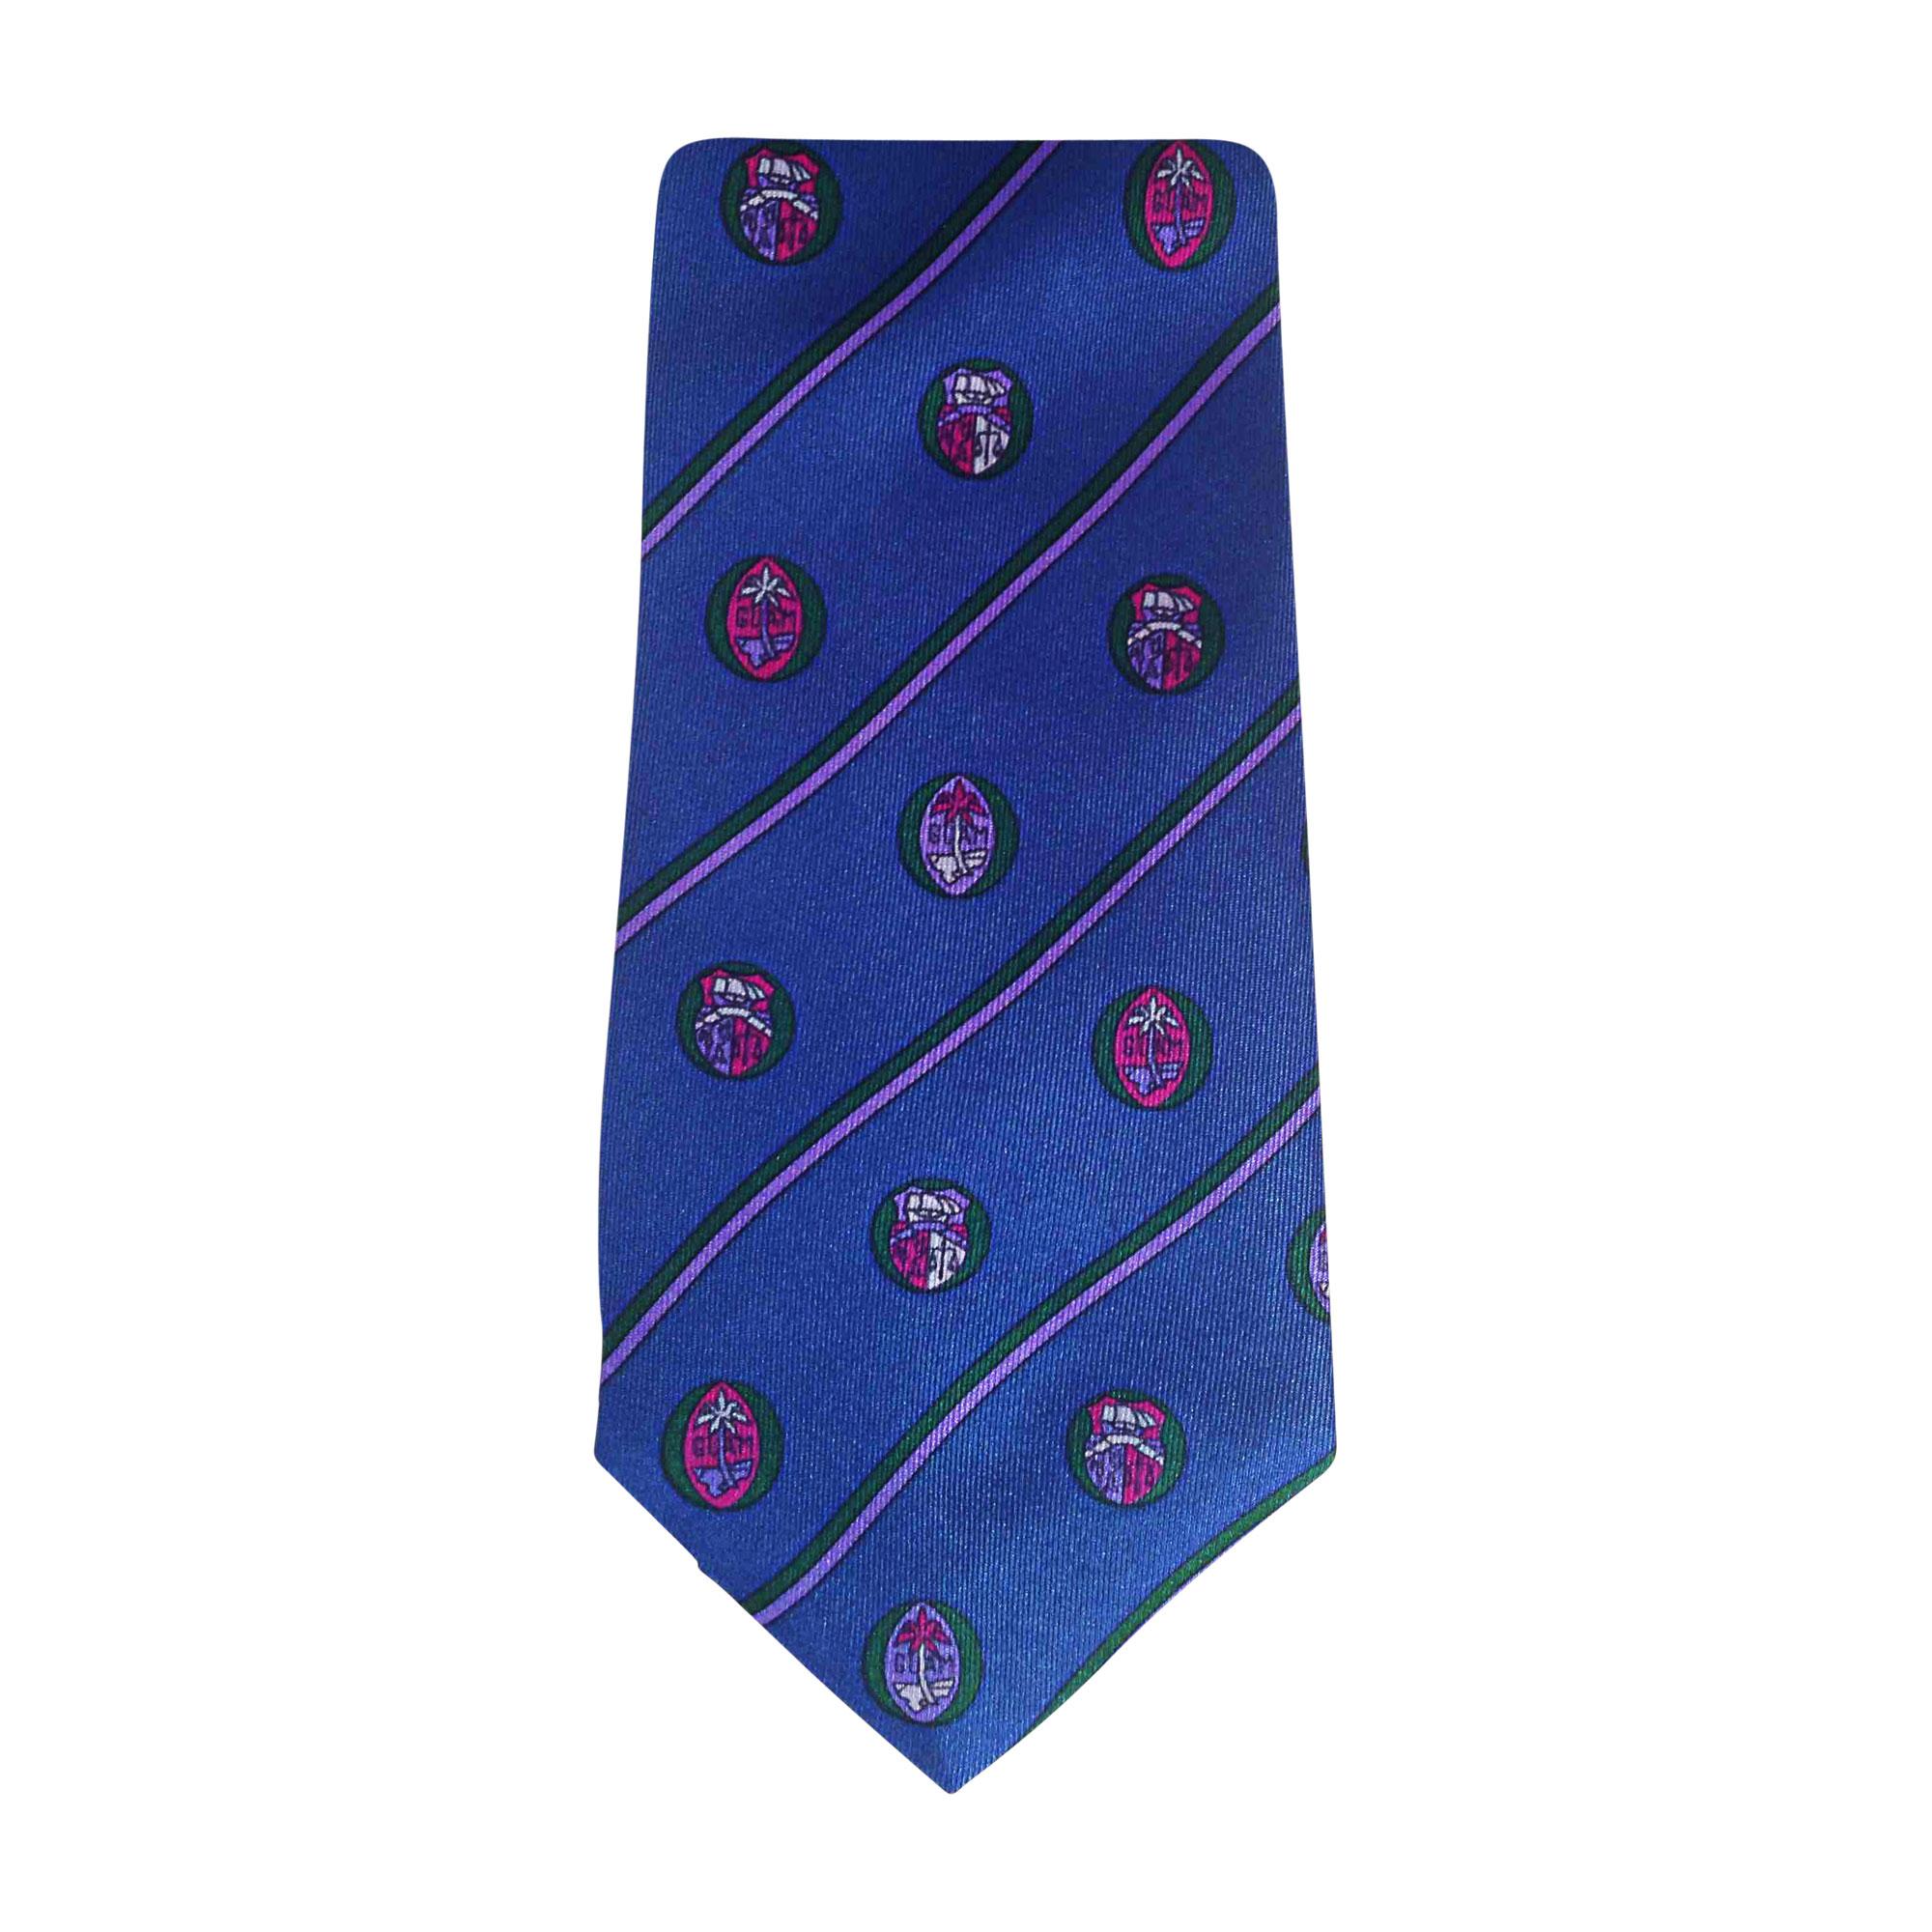 Krawatte YVES SAINT LAURENT Blue with motives